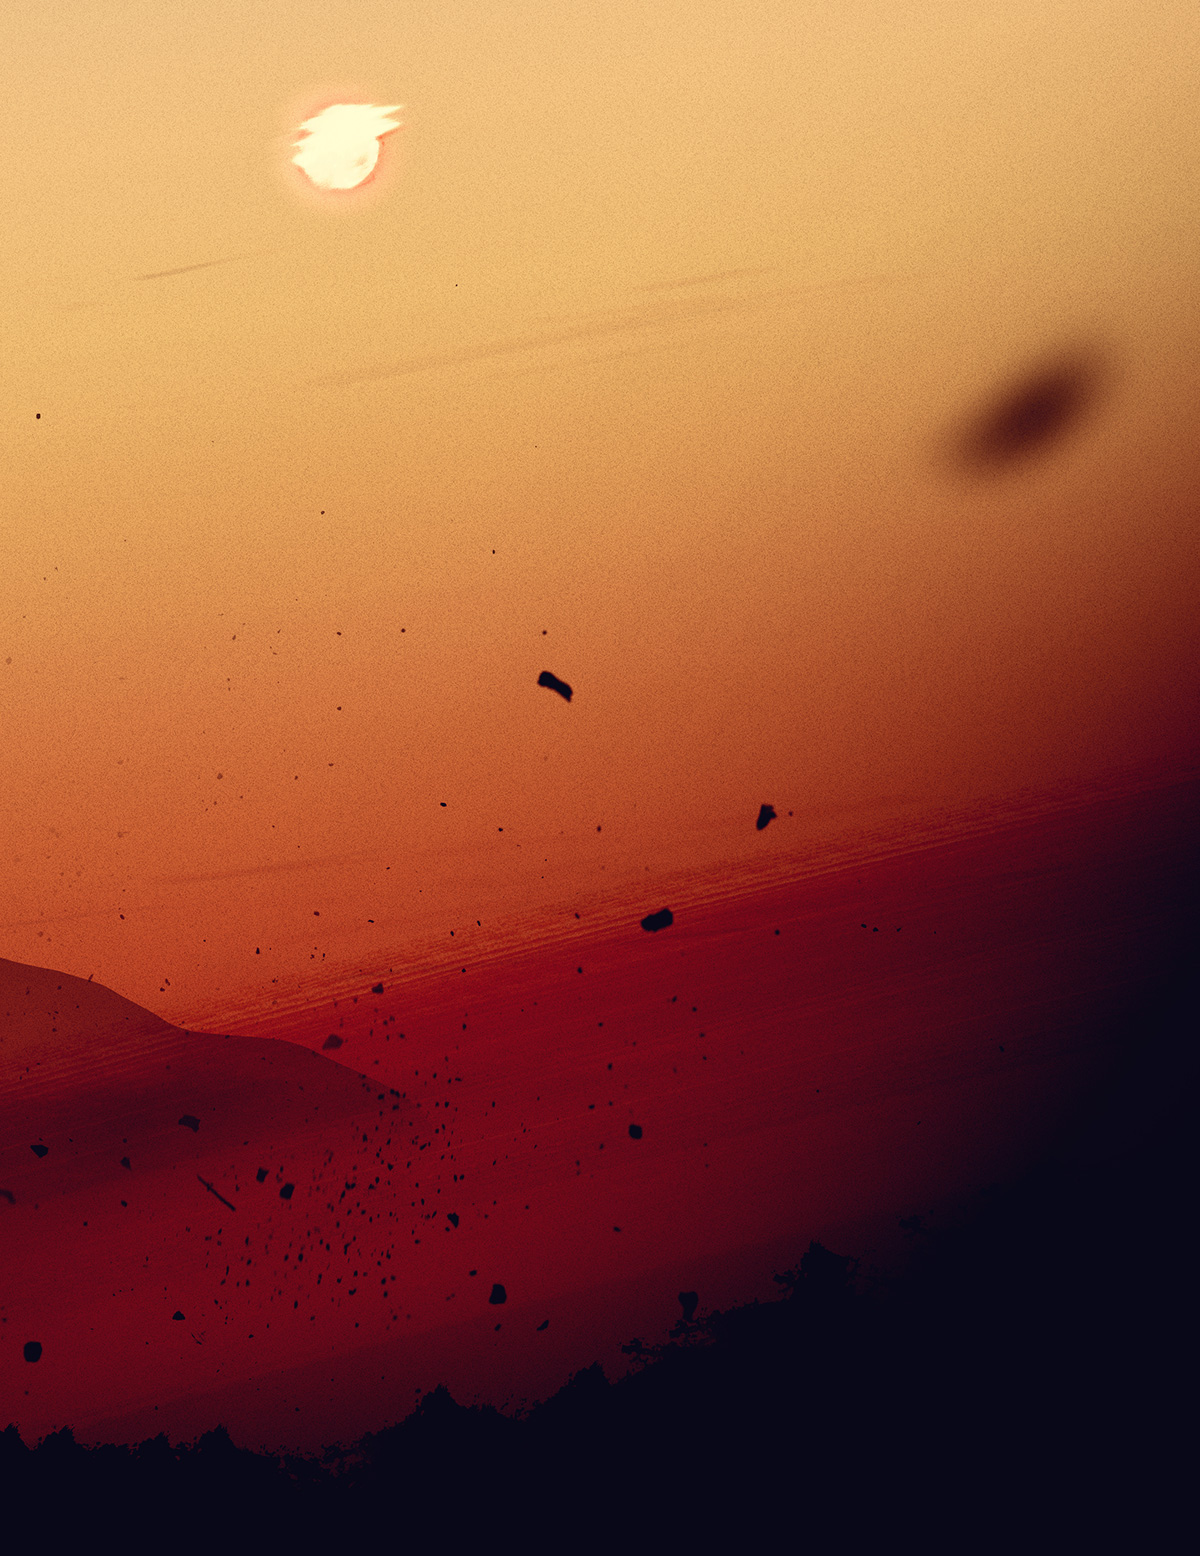 storm desert Sun DISTORTED dust rest Silhouette redshift distortion Landscape noise mountains contrast